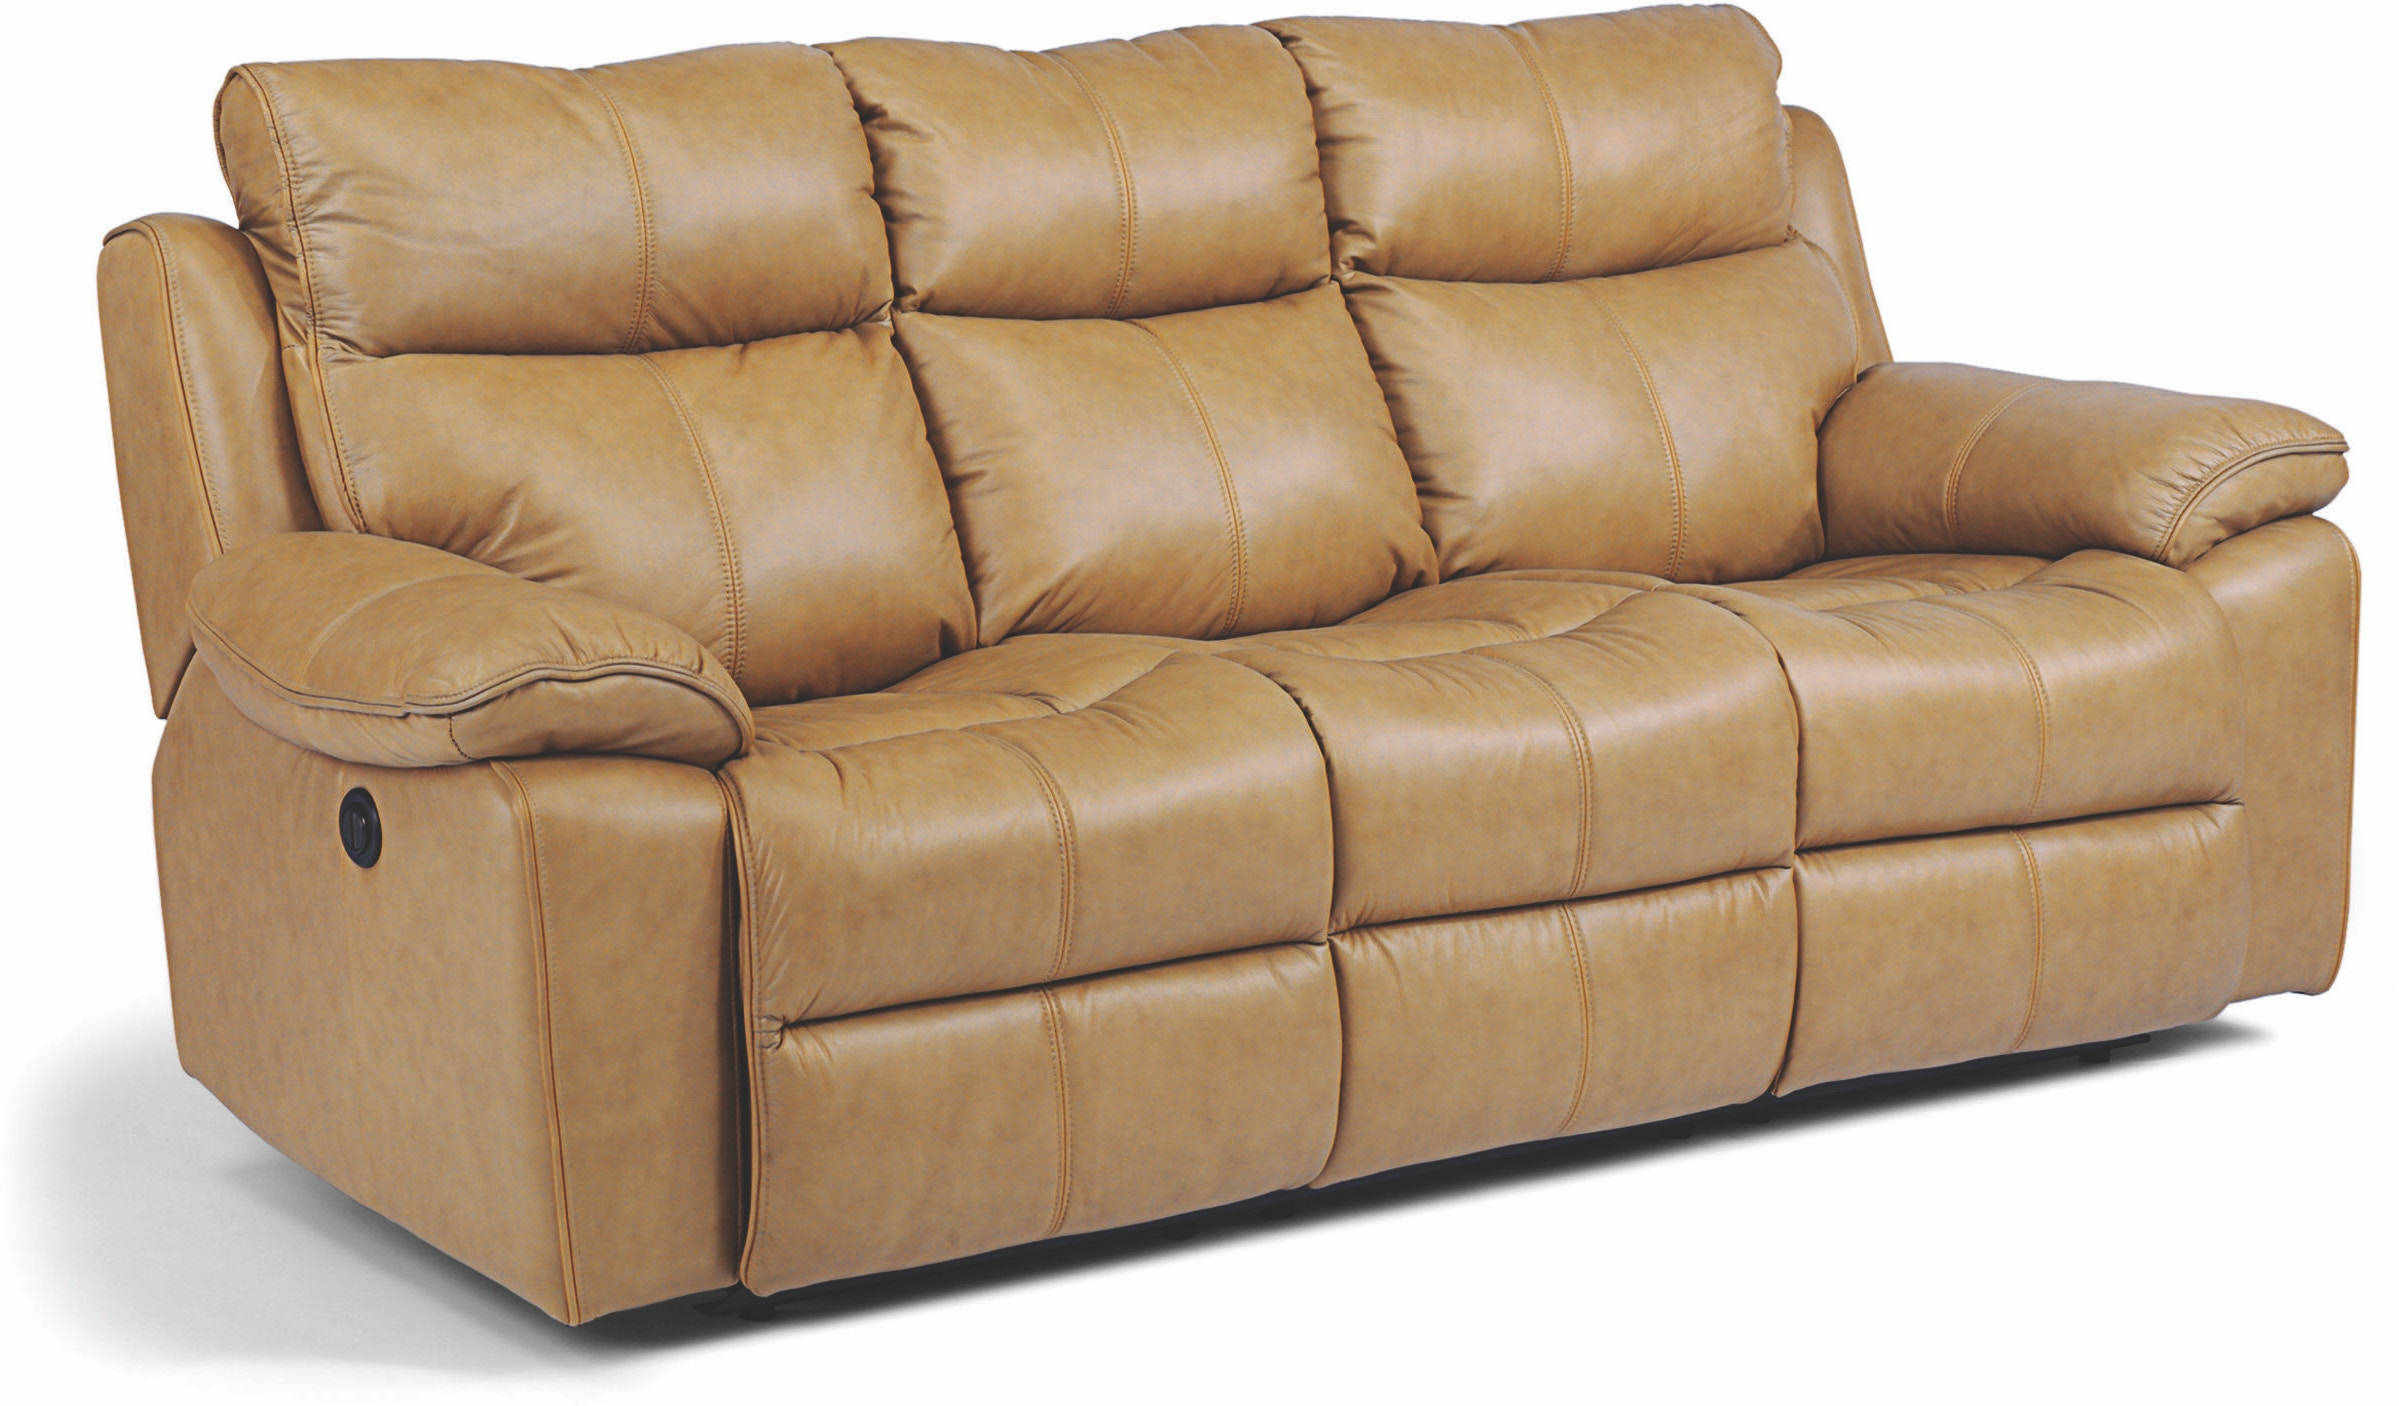 Flexsteel Living Room Julio Power Reclining Sofa